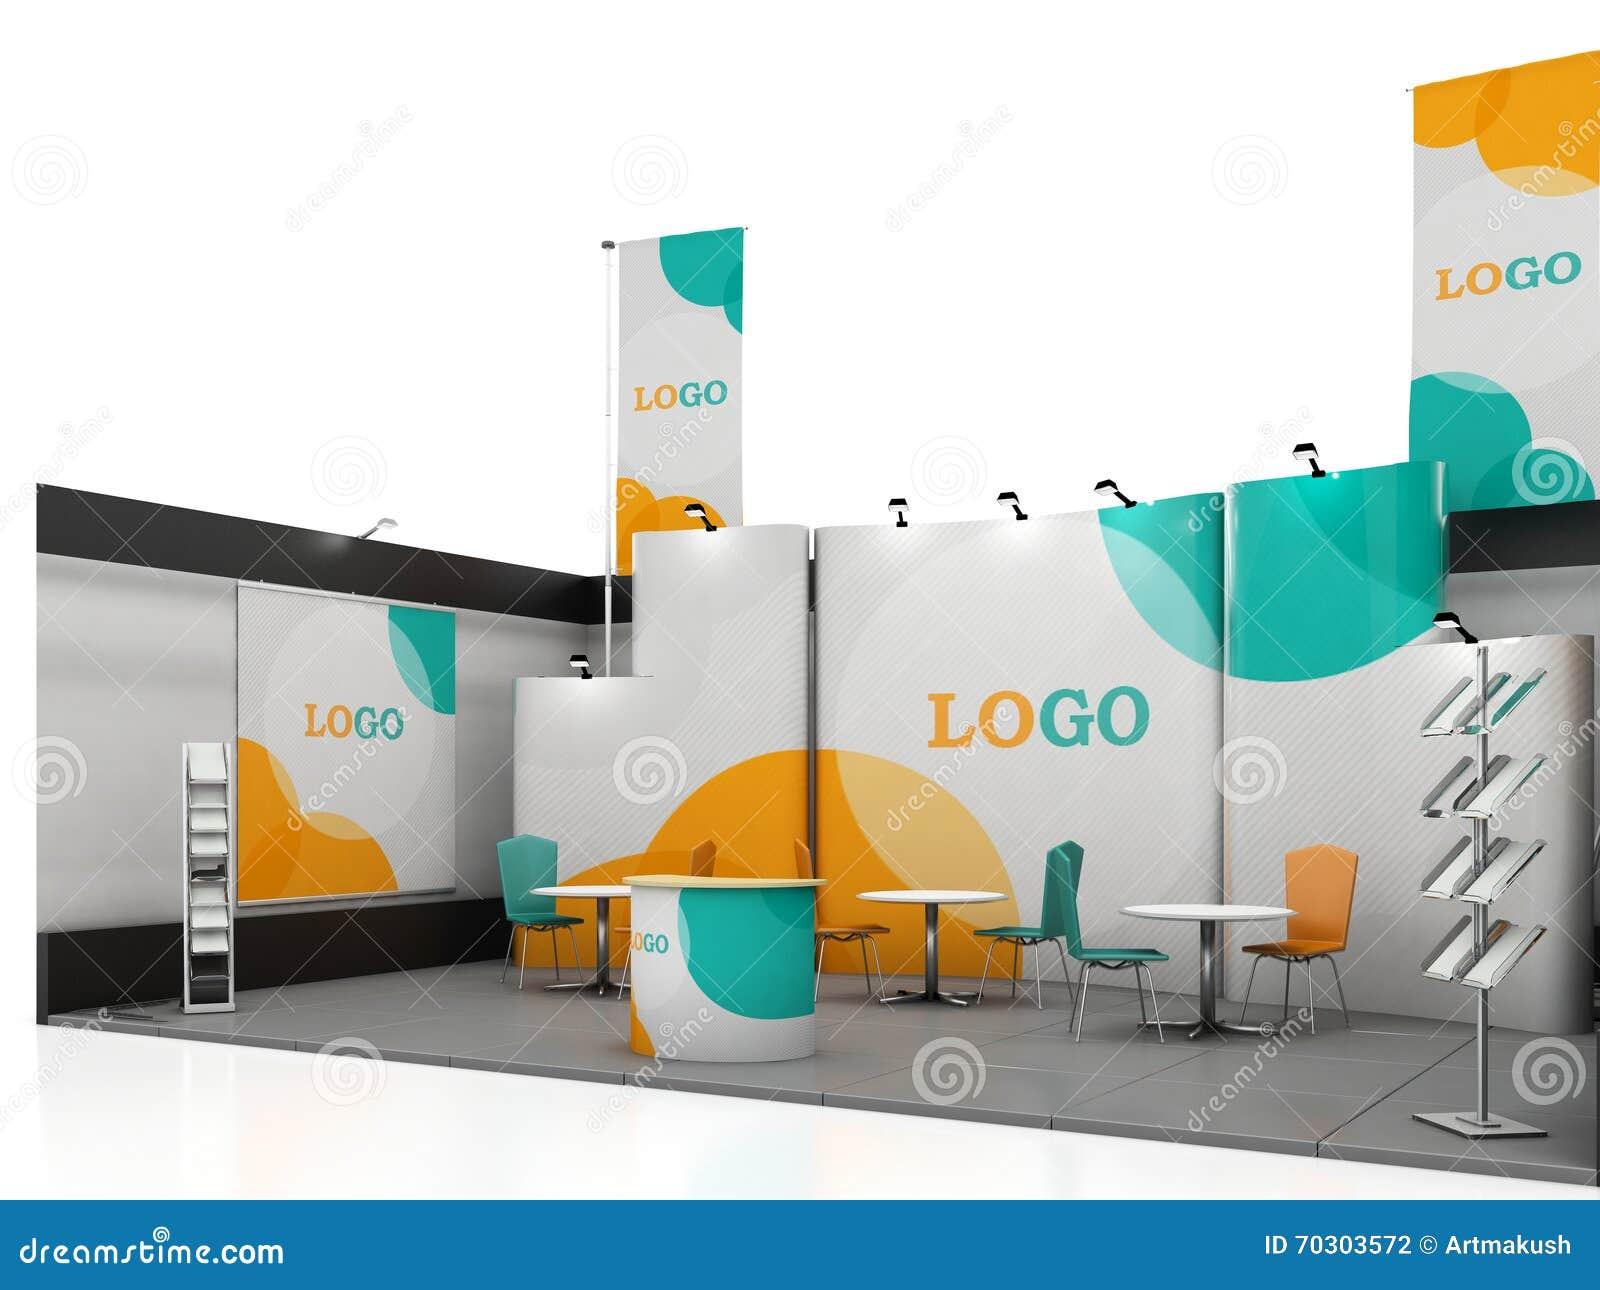 Small Exhibition Stand Mockup : 与颜色的空白的创造性的陈列立场设计塑造 摊模板 库存例证 插画 包括有 公司 brandywine 会议室